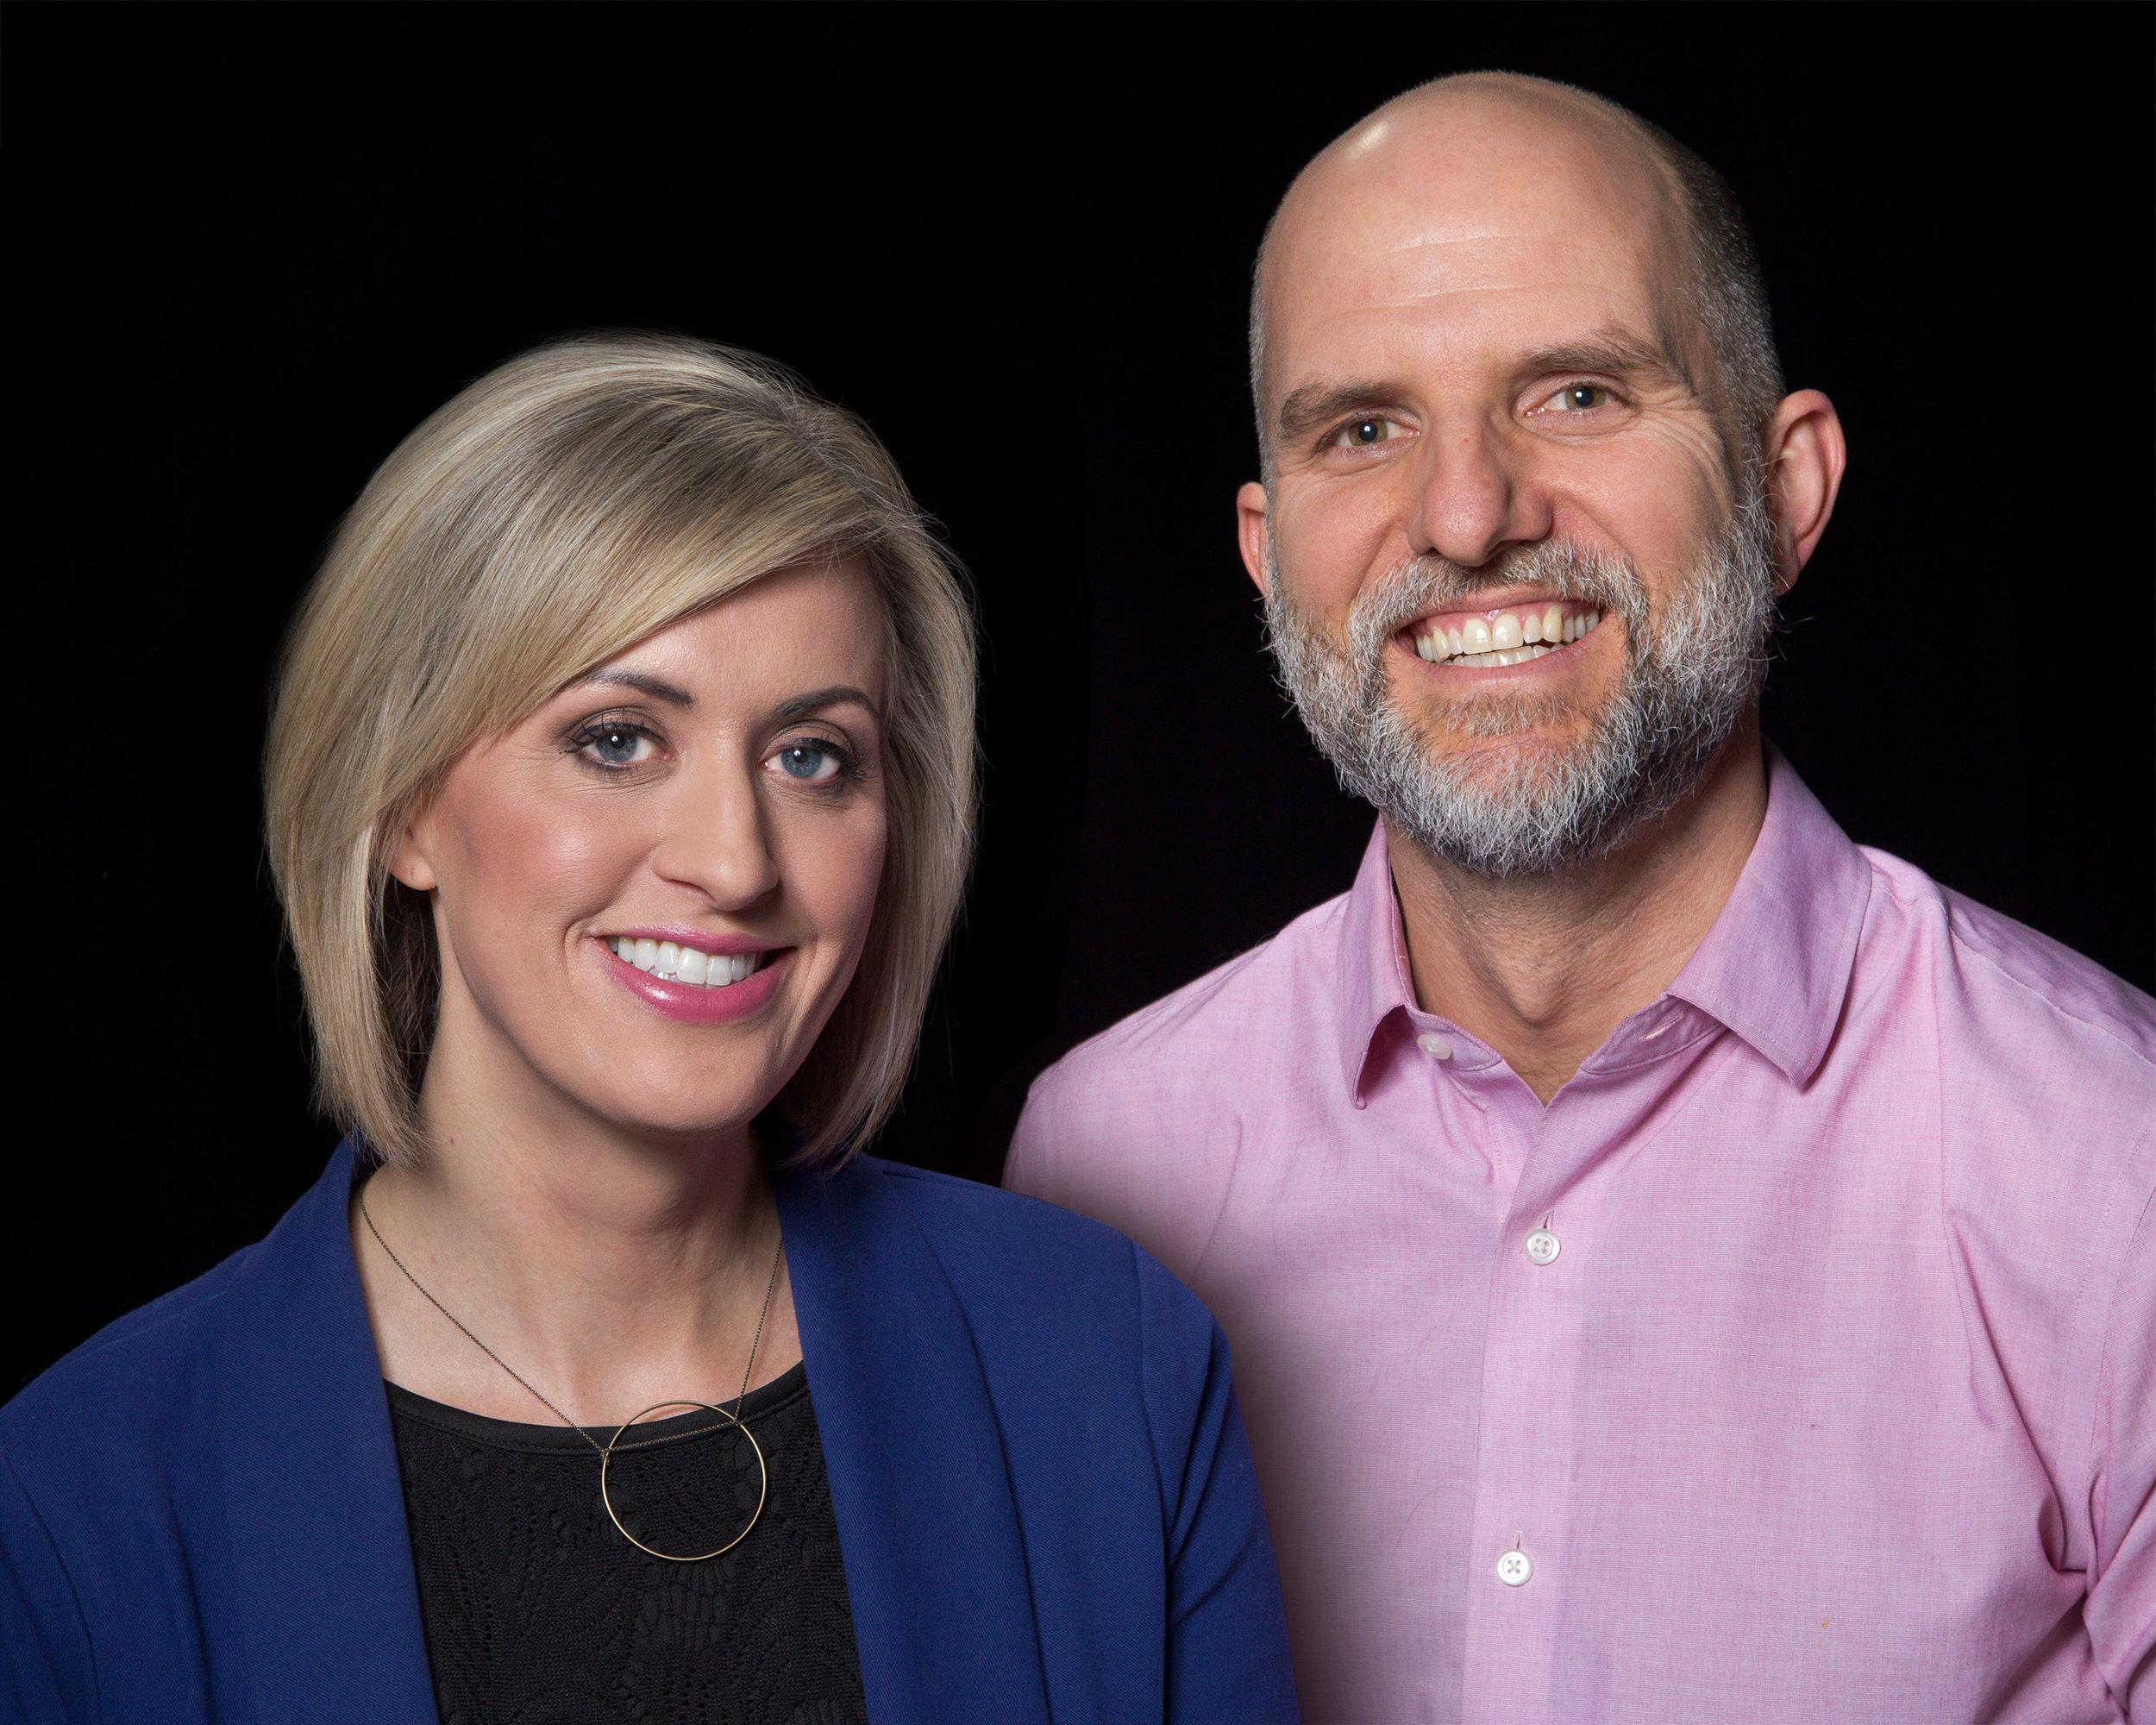 Lindsey Seavert (left) and Ben Garvin (right).  Photo courtesy of KARE11